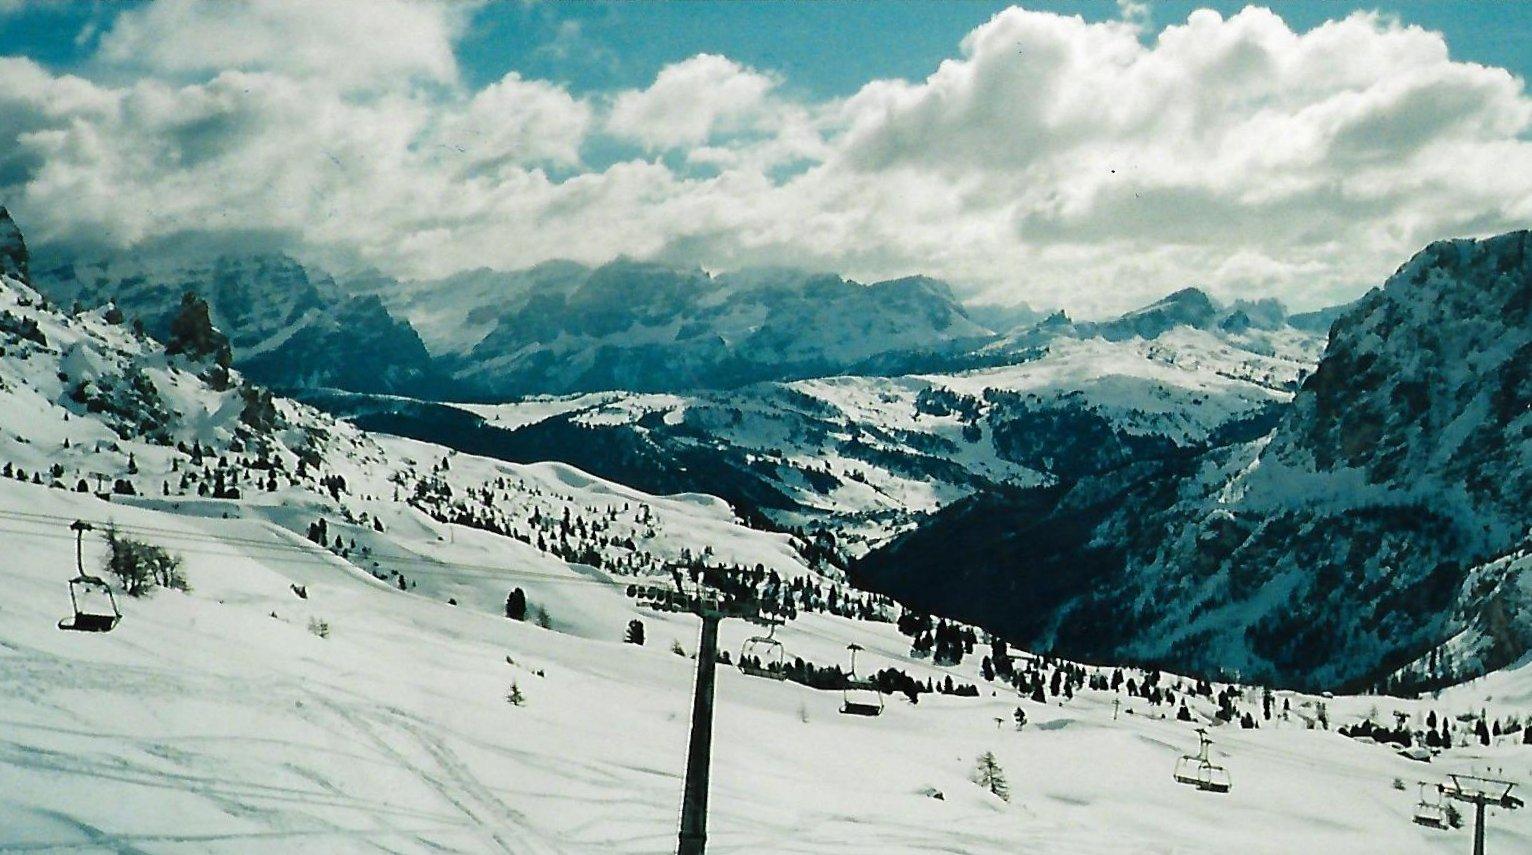 Skigebiet Grödnertal - Abfahrt vom Grödnerjoch nach Kolfuschg